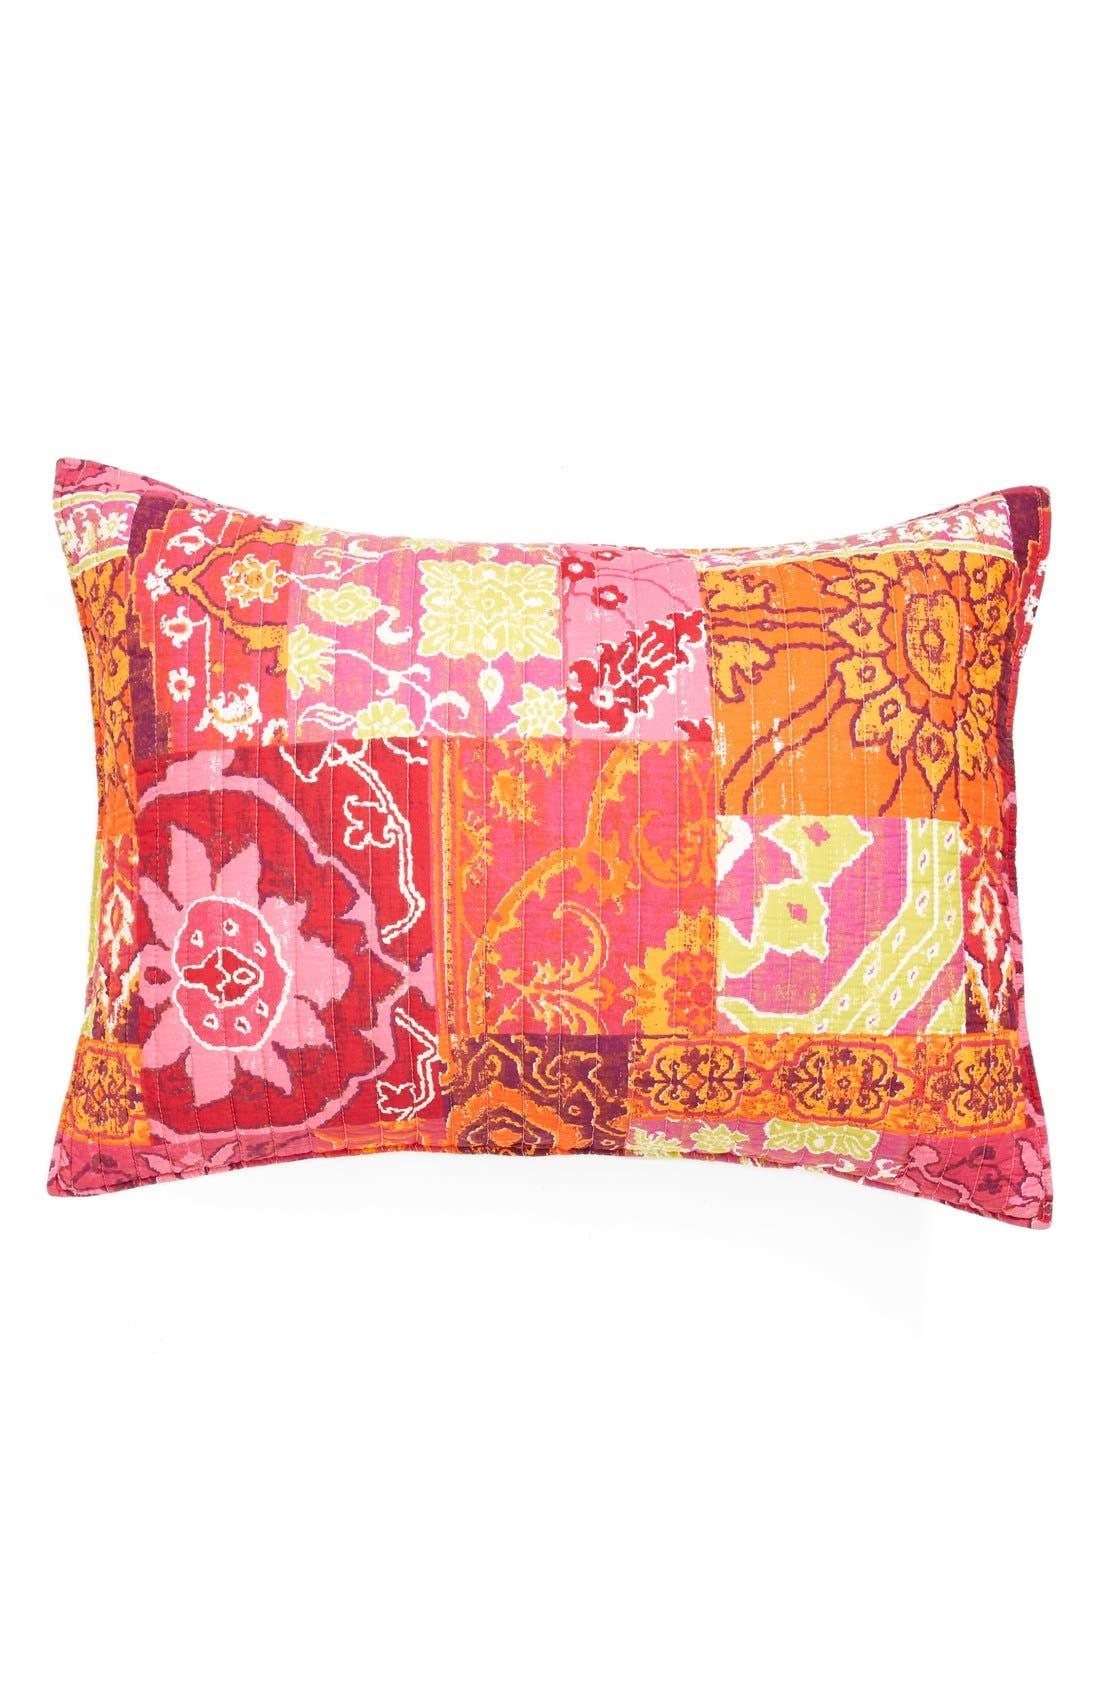 Alternate Image 1 Selected - Levtex 'Aja Bright' Pillow Sham